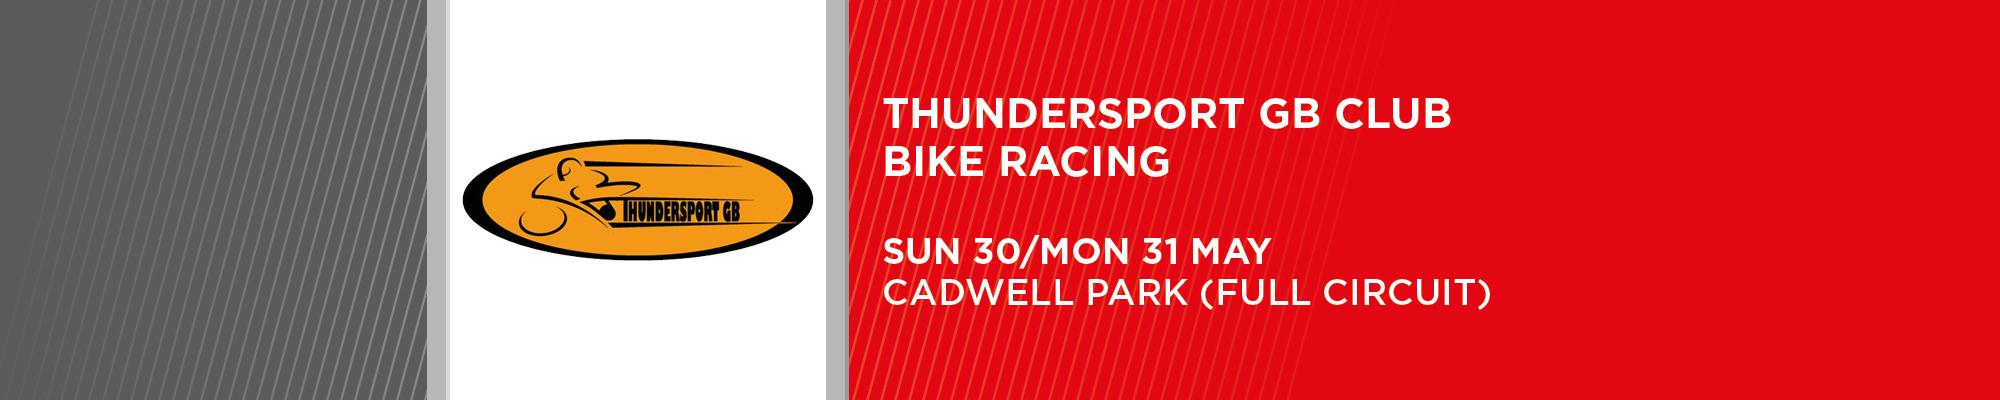 Thundersport GB Club Bike Racing